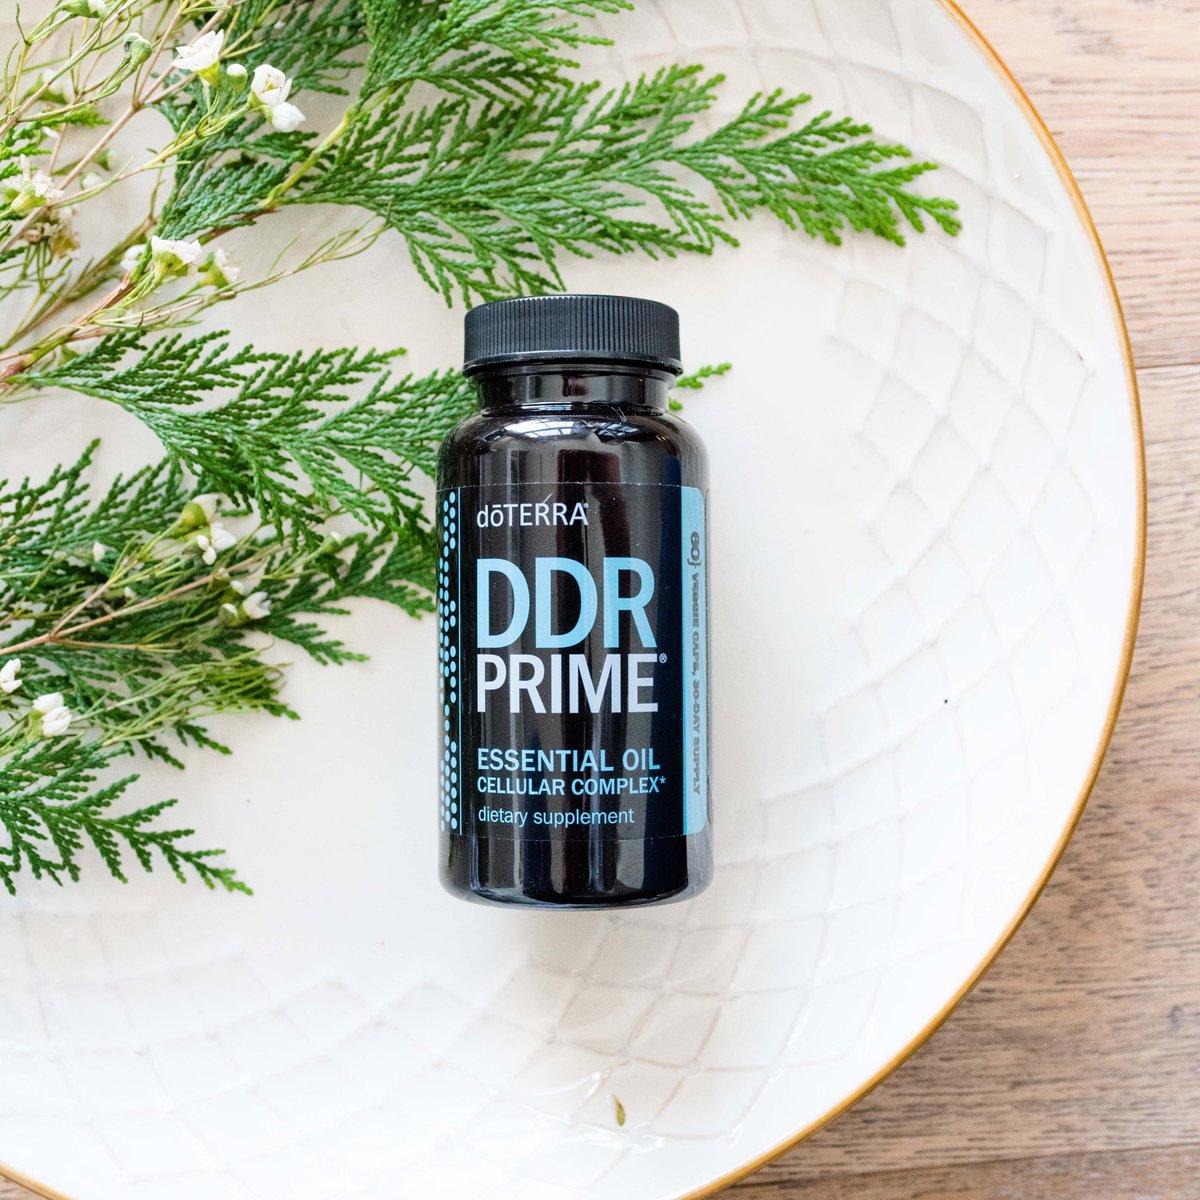 DDR-PRIME